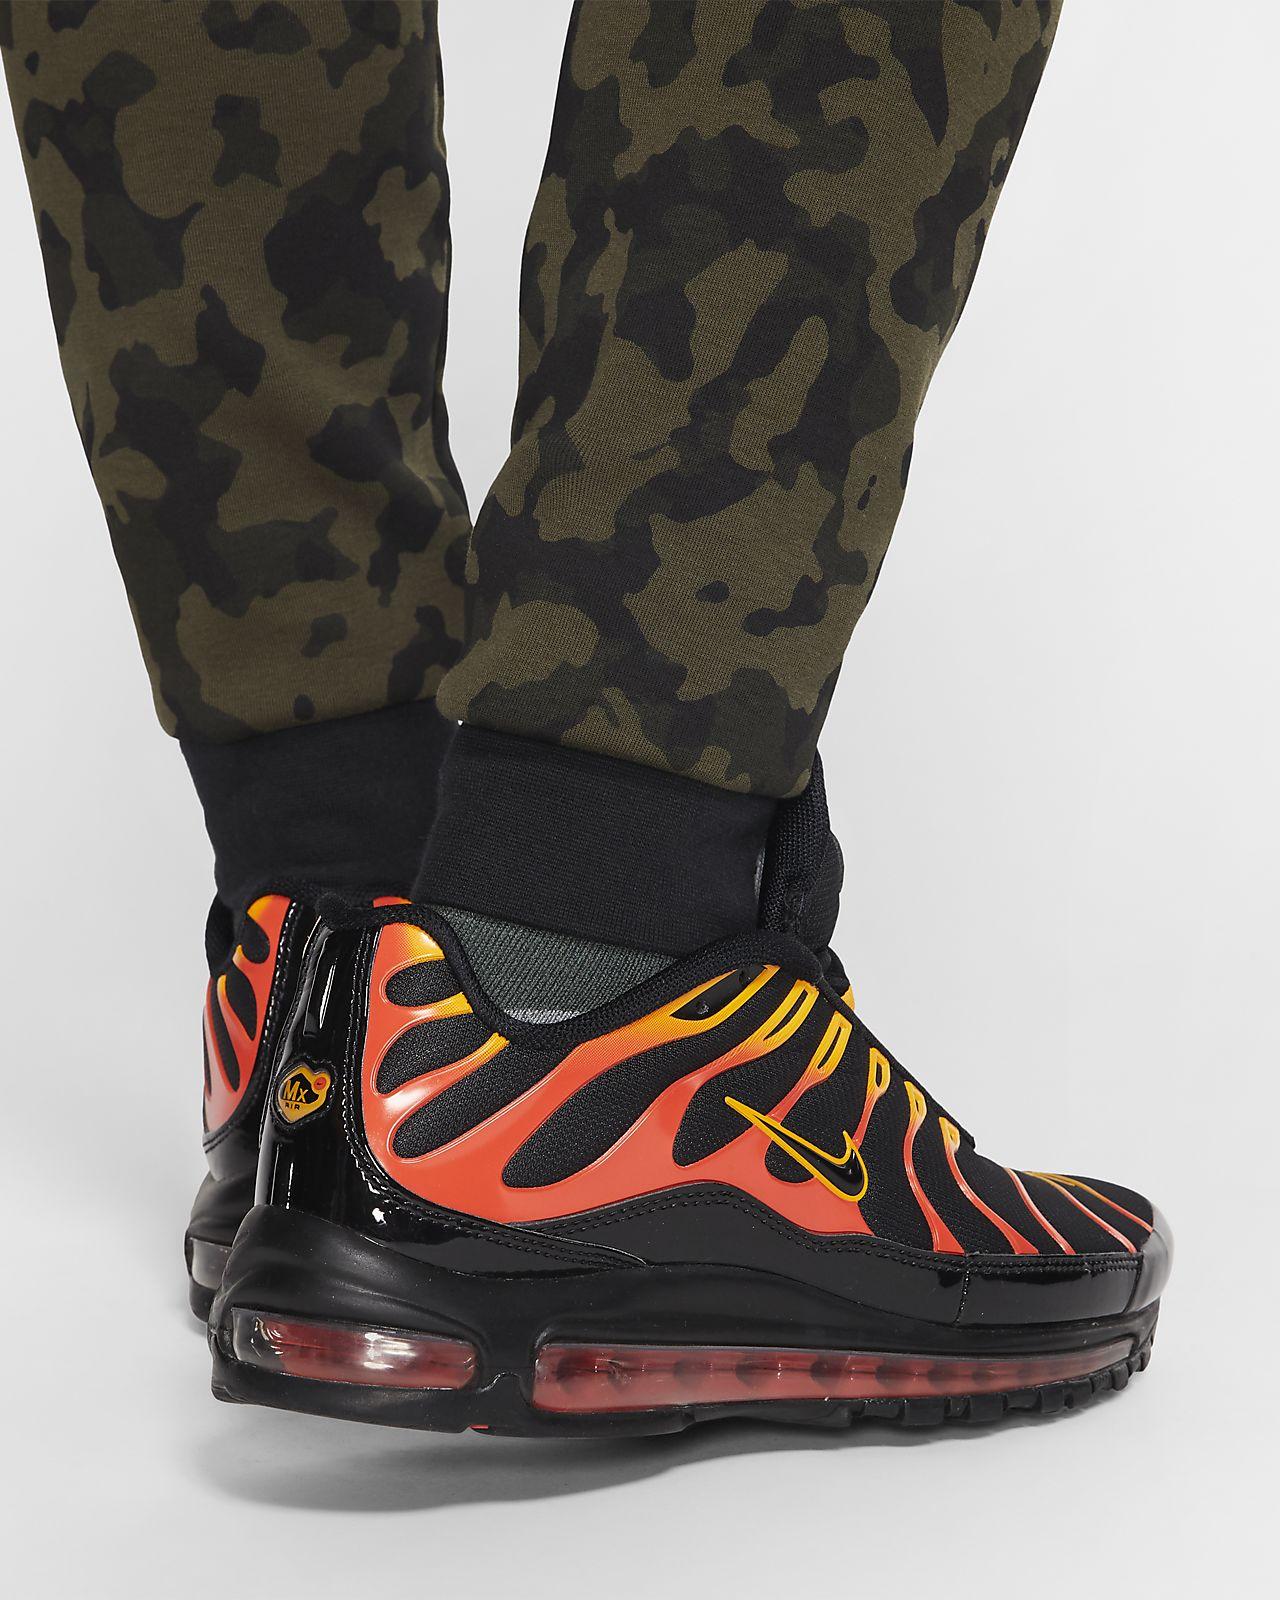 Nike Air Force 1 Low 'Camo' Medium OliveBlack For Sale